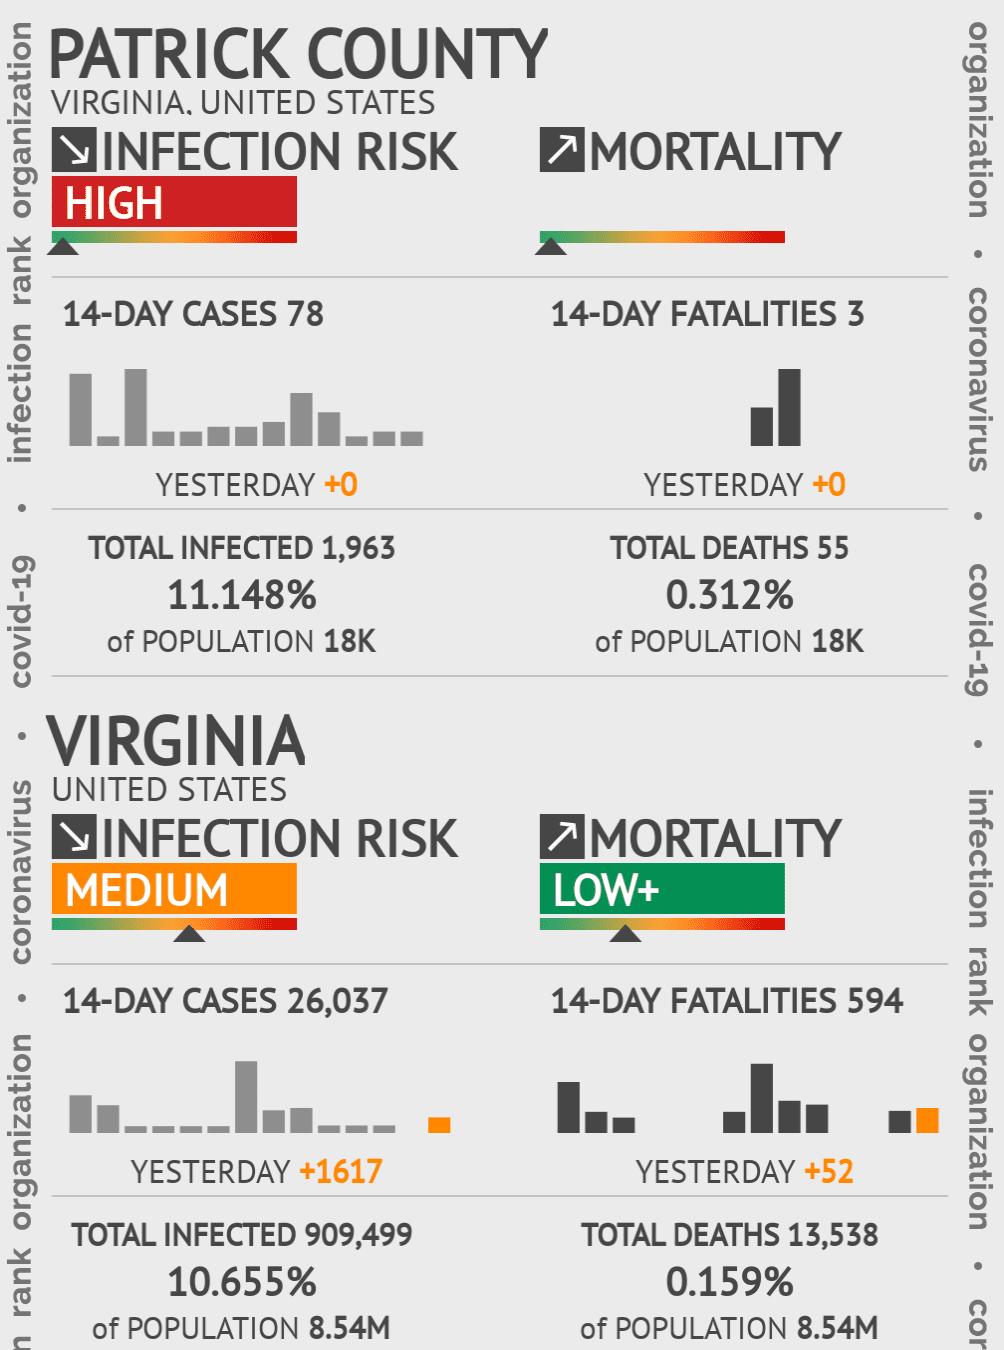 Patrick County Coronavirus Covid-19 Risk of Infection on July 24, 2021